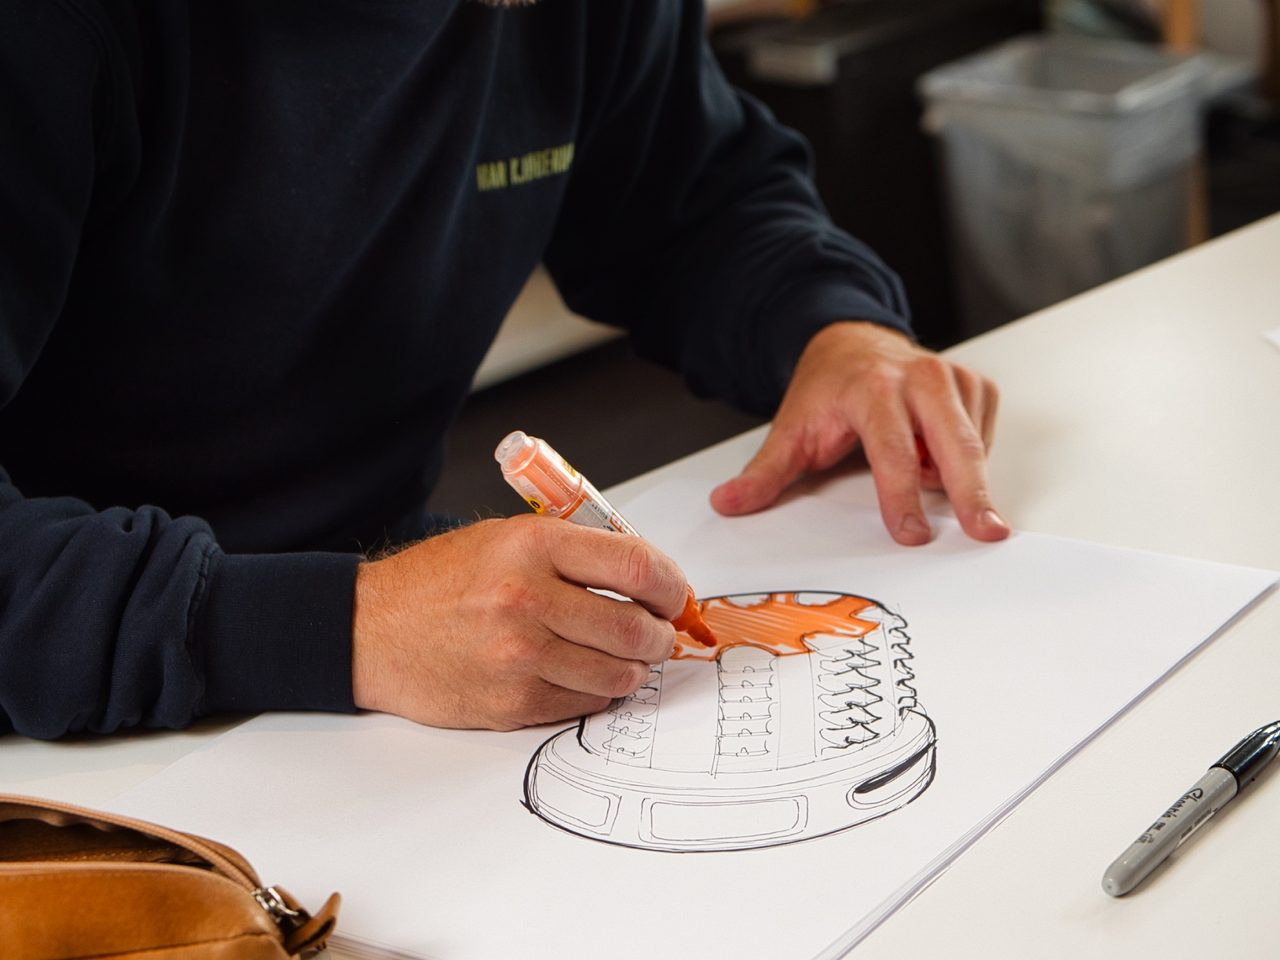 Writing instrument accessory, Automotive design, Office supplies, Table, Desk, Pen, Tableware, Finger, Art